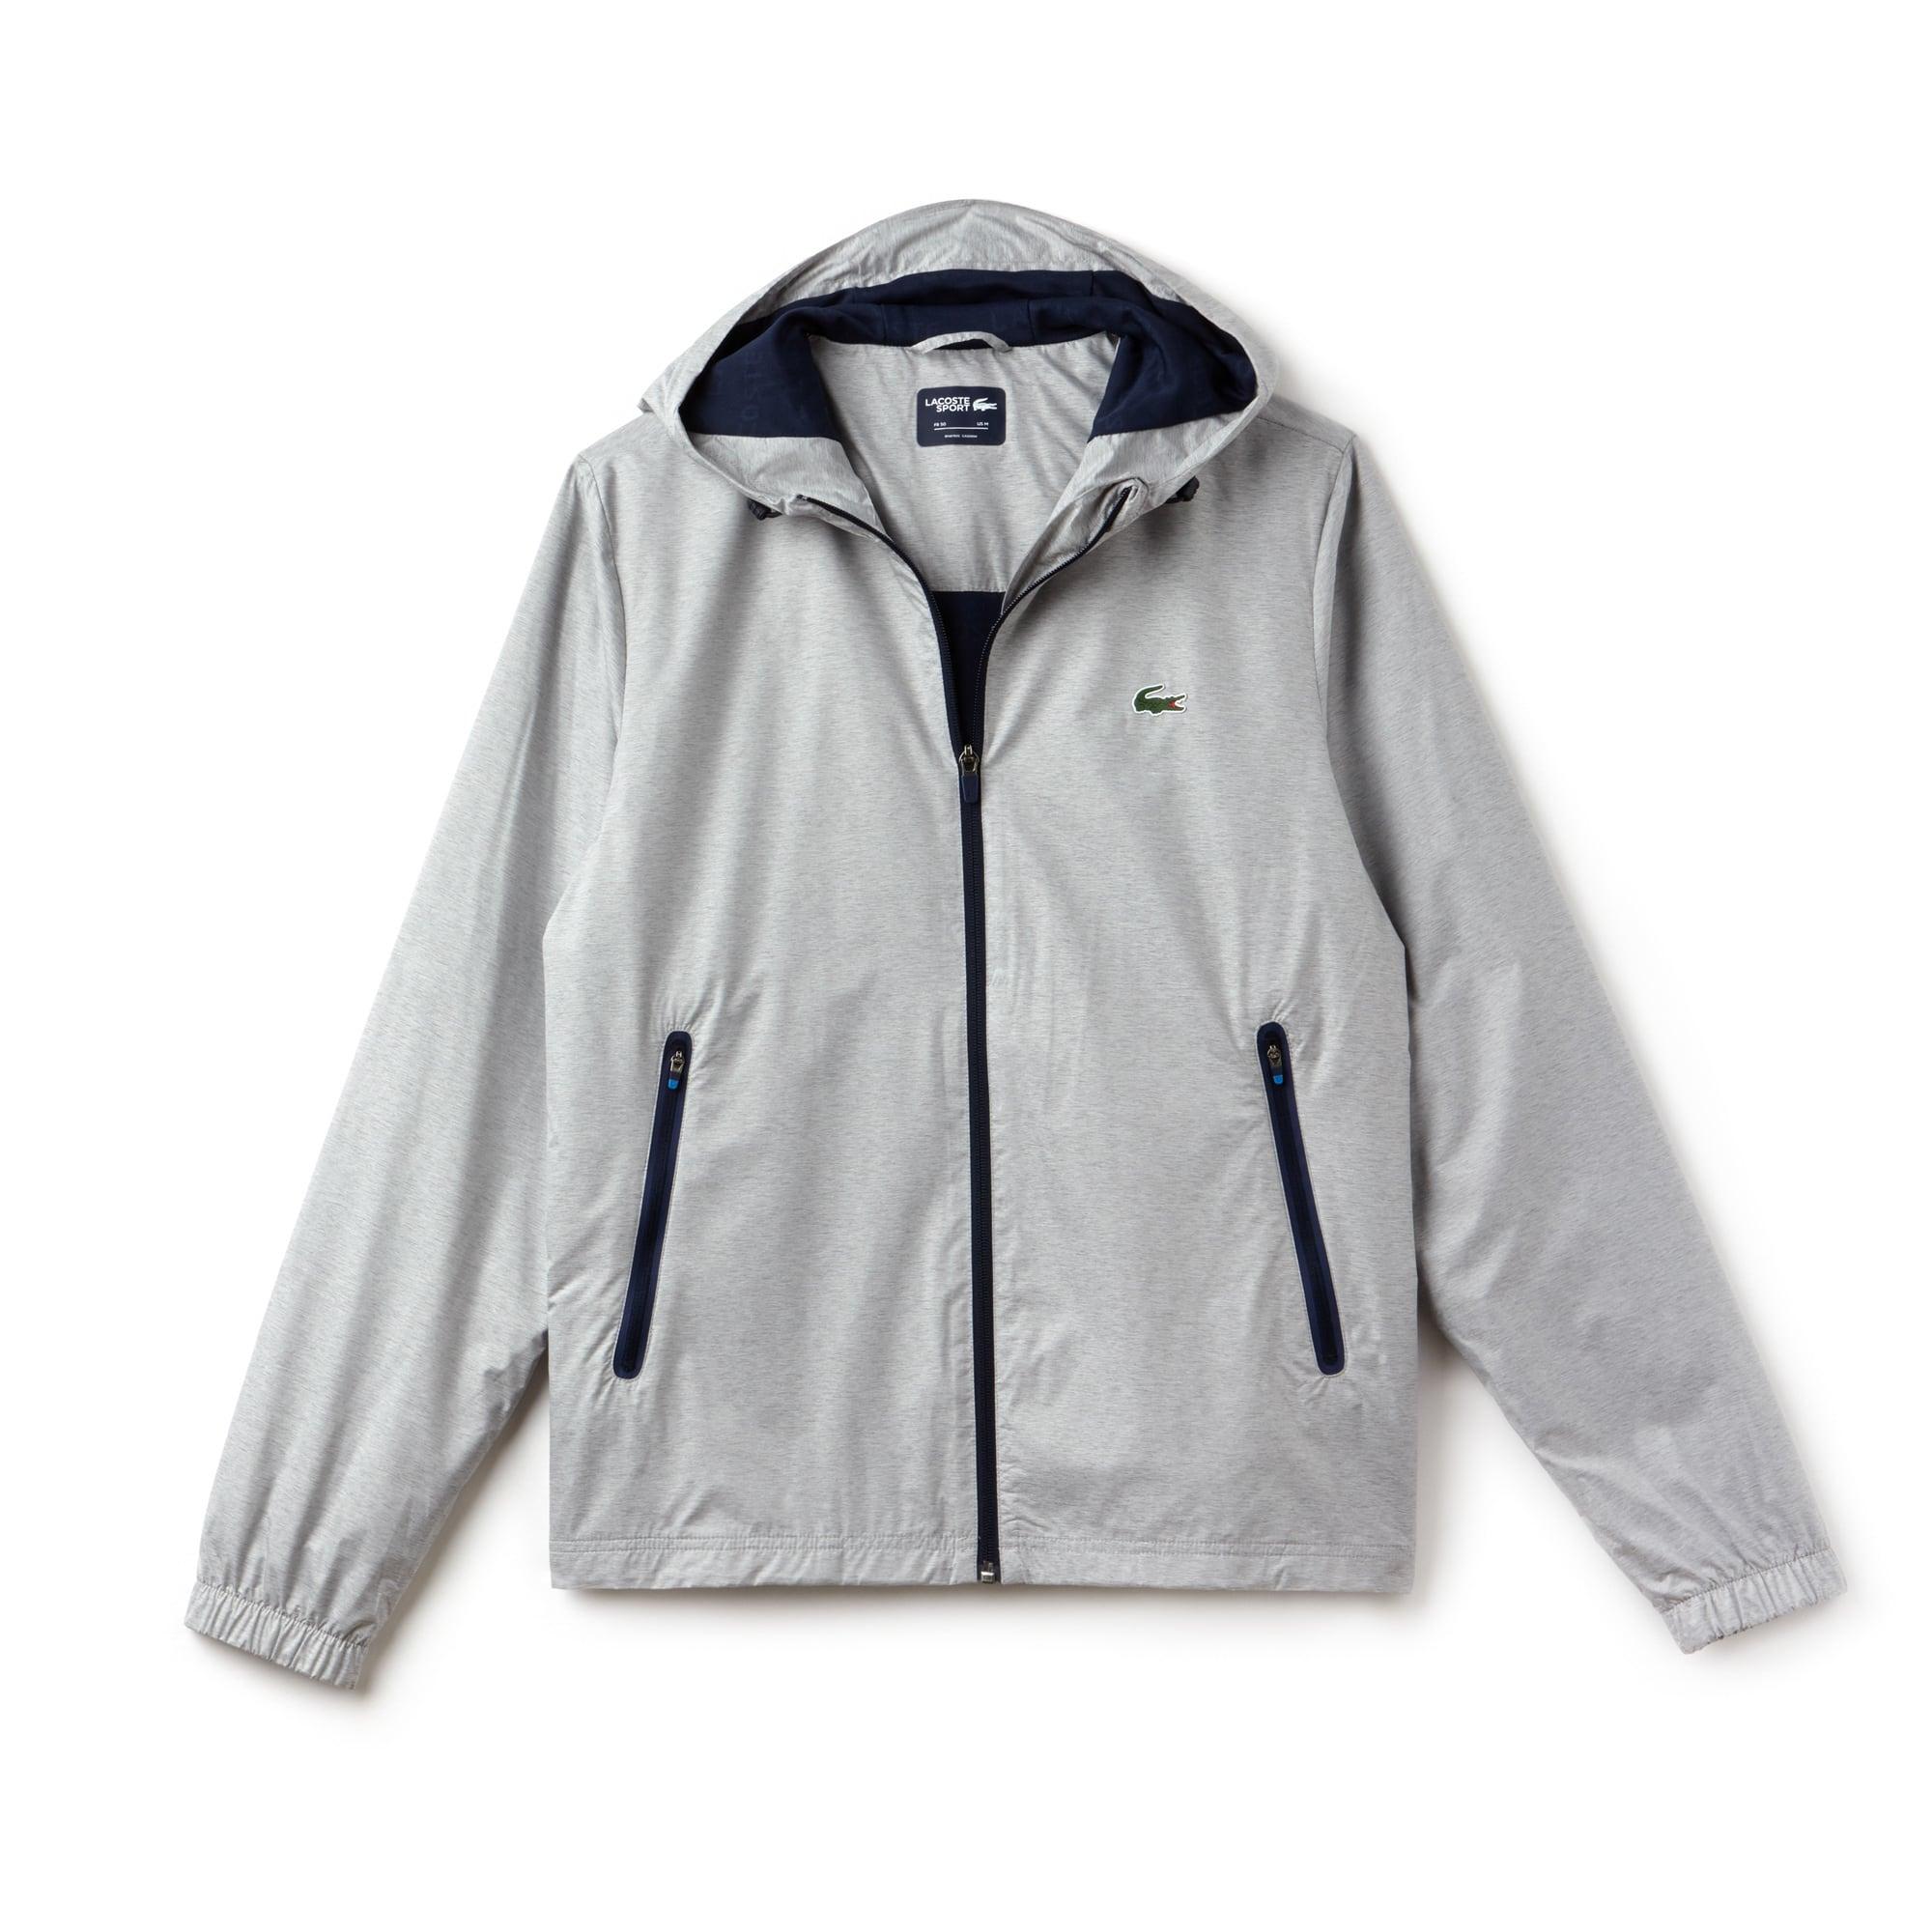 Men's Lacoste SPORT Metallic Technical Taffeta Zip Golf Jacket